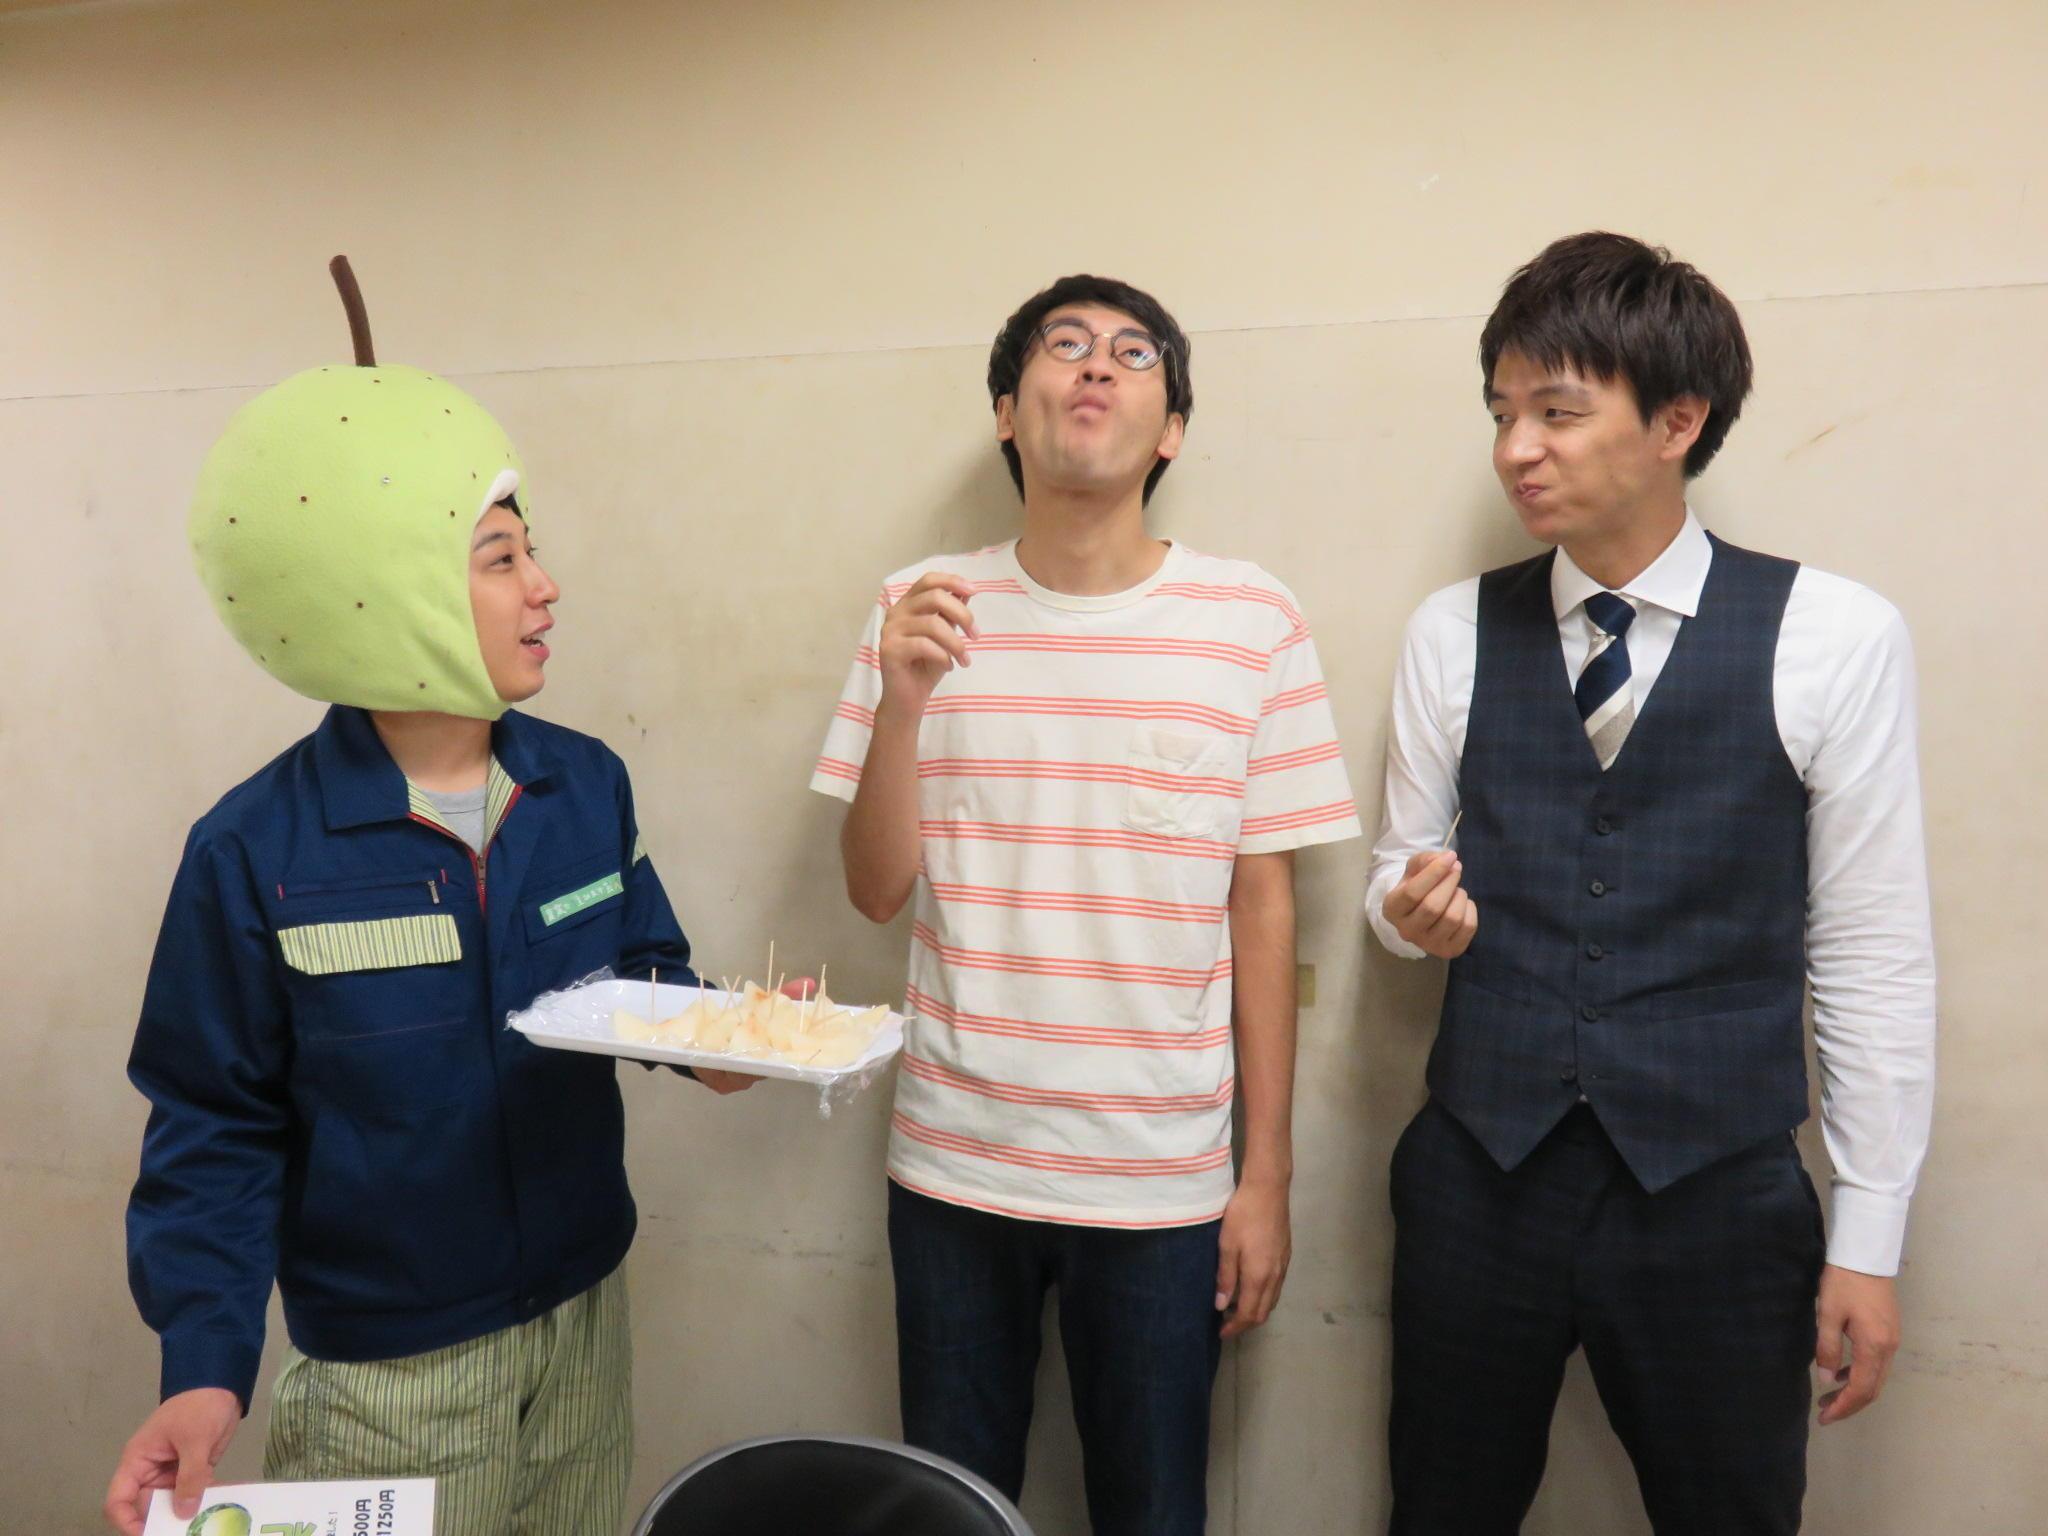 http://news.yoshimoto.co.jp/20170909015241-6948a66eaa65923aaafe90c08f7d5b9e1abc0294.jpg